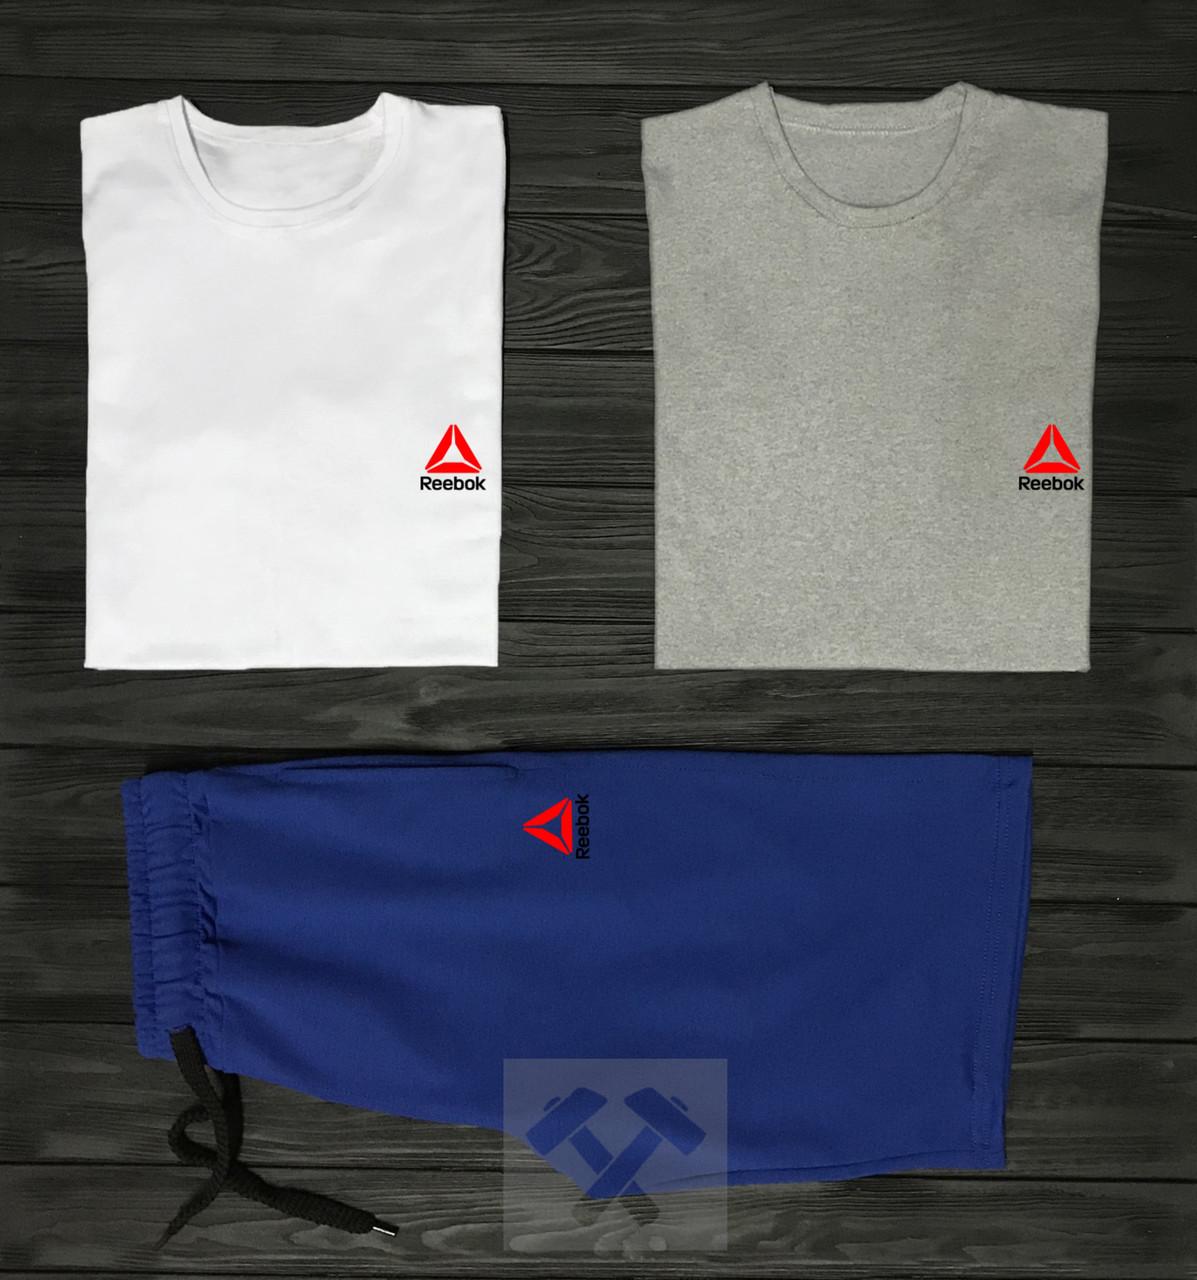 Мужской костюм тройка 2 футболки и шорты Рибок (Reebok), Турецкий трикотаж, копия